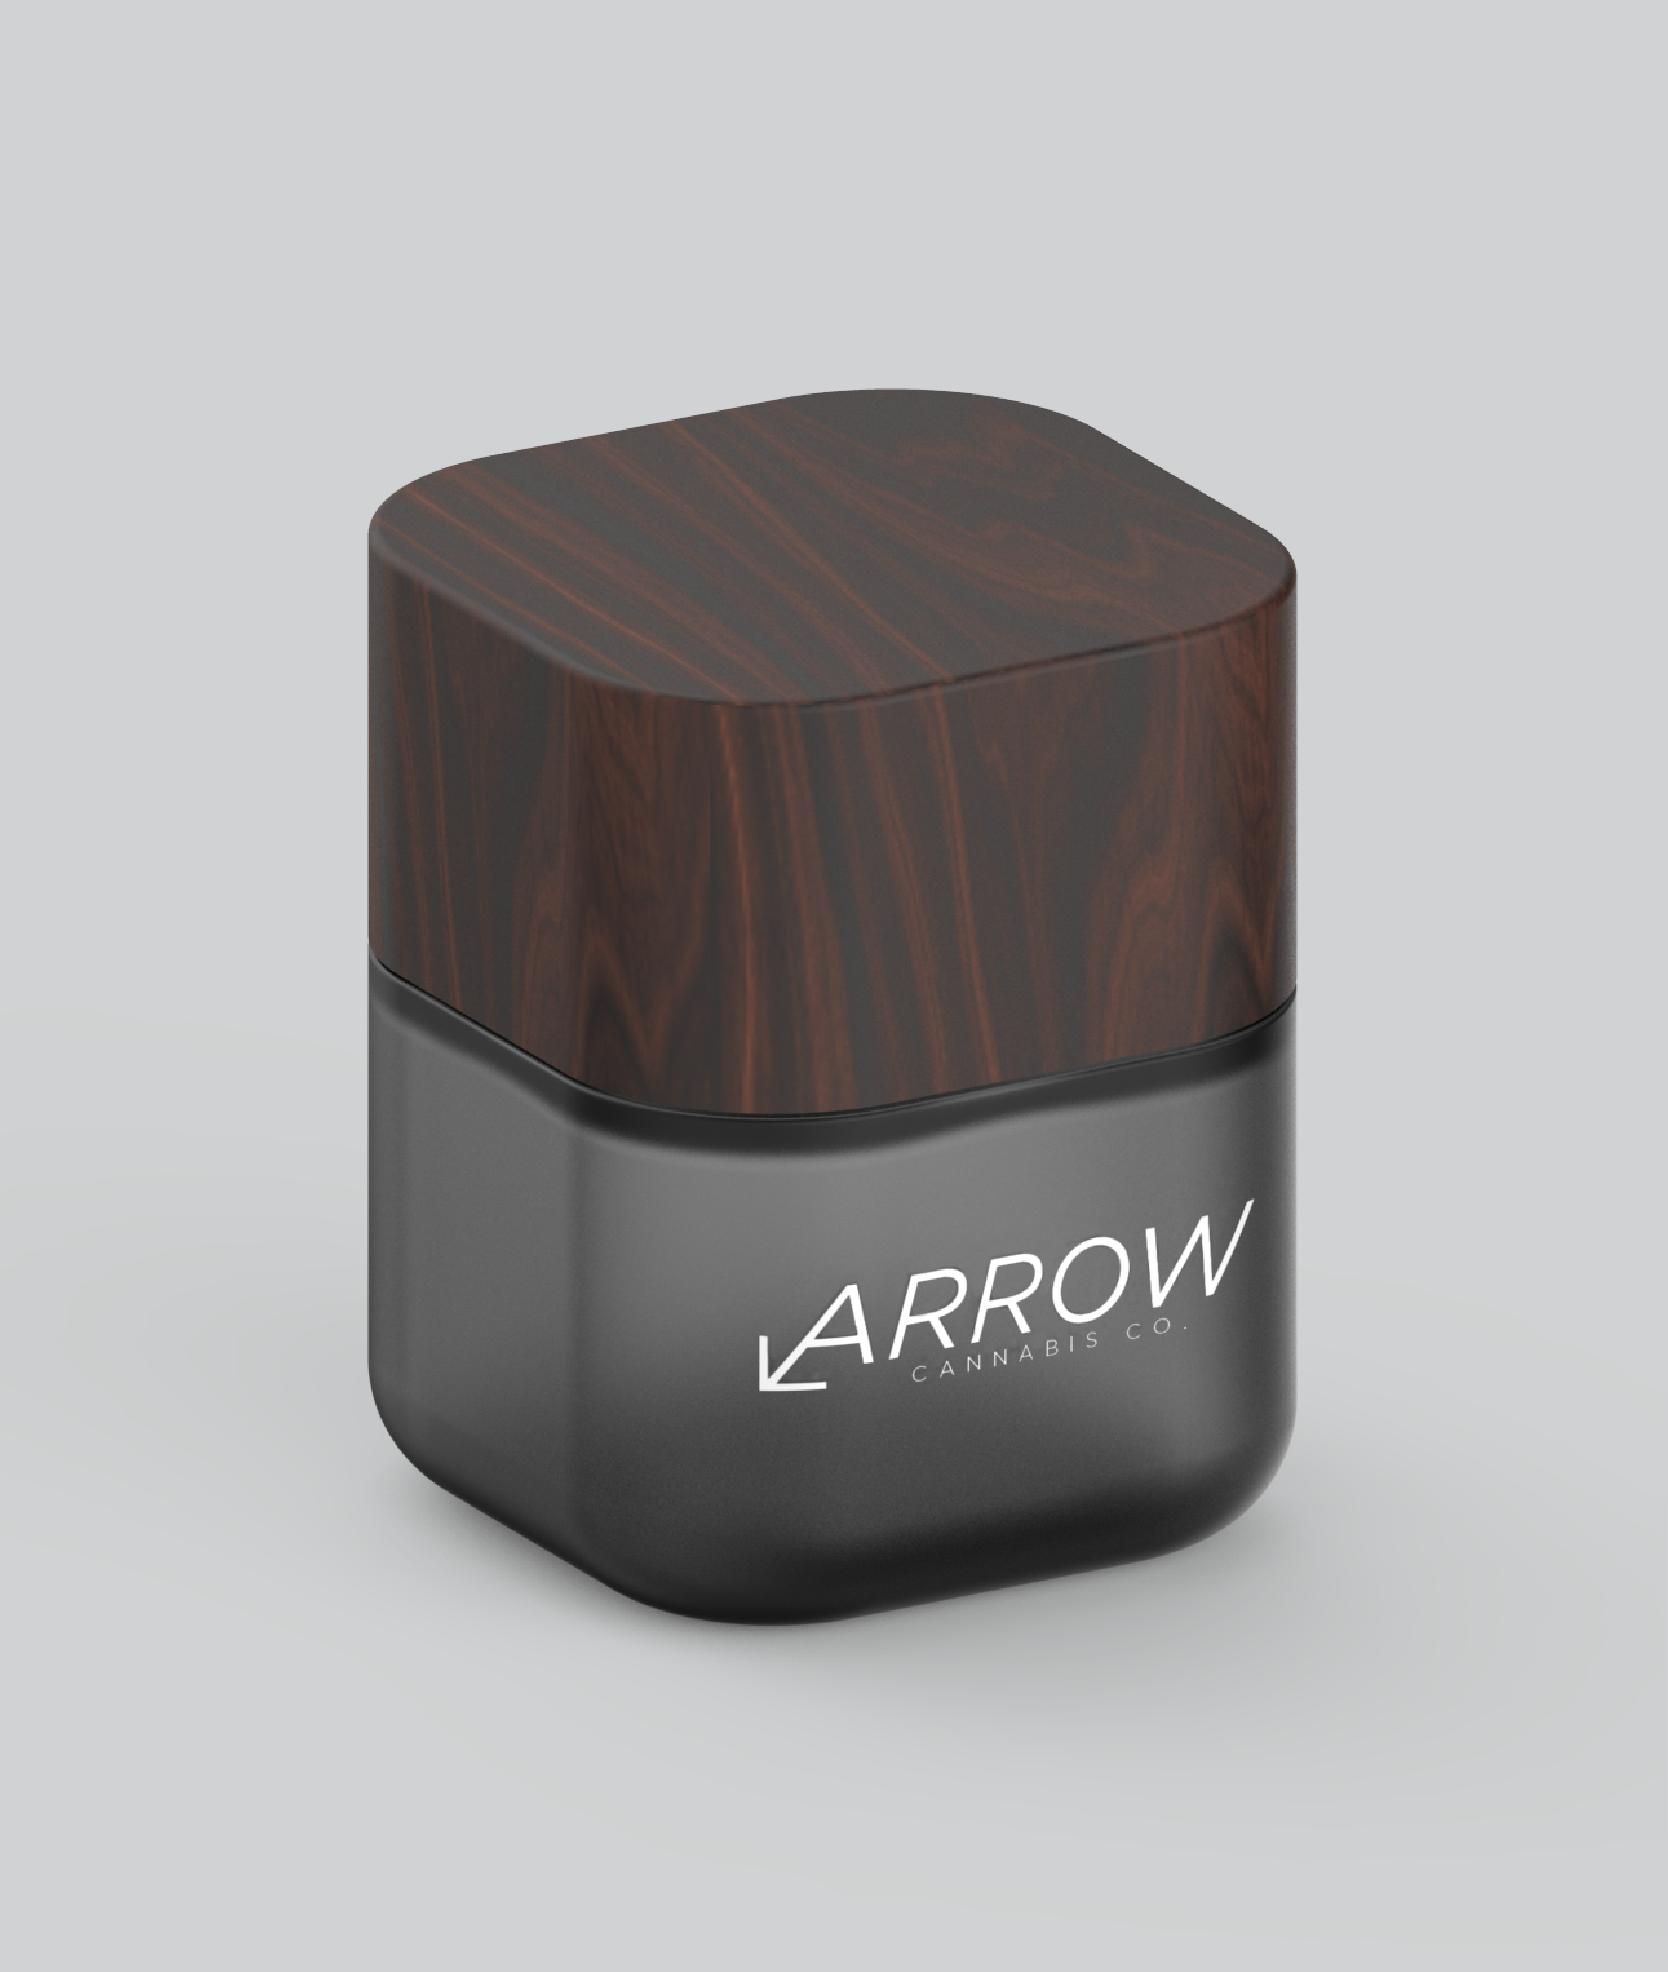 Arrow-custom-softsquare-glass-weed-jars